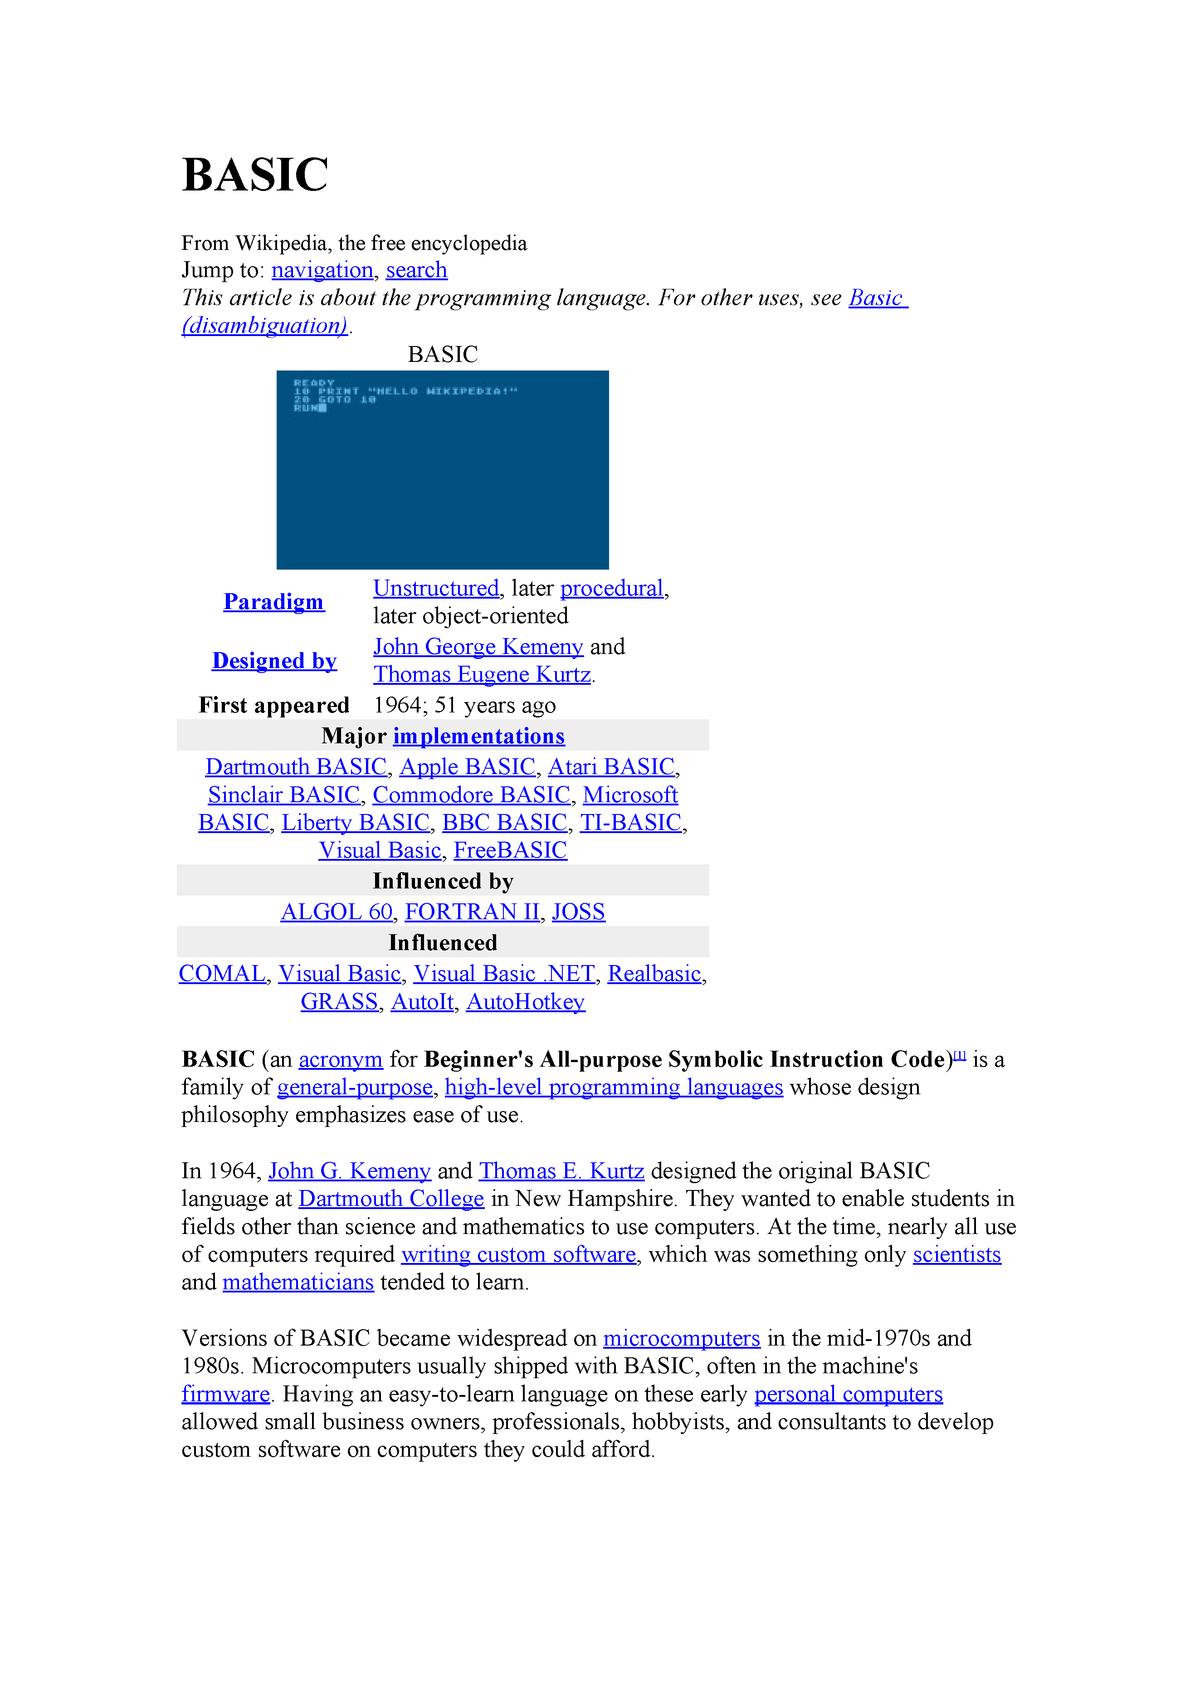 psychology notes - Social Advertising Management - StuDocu